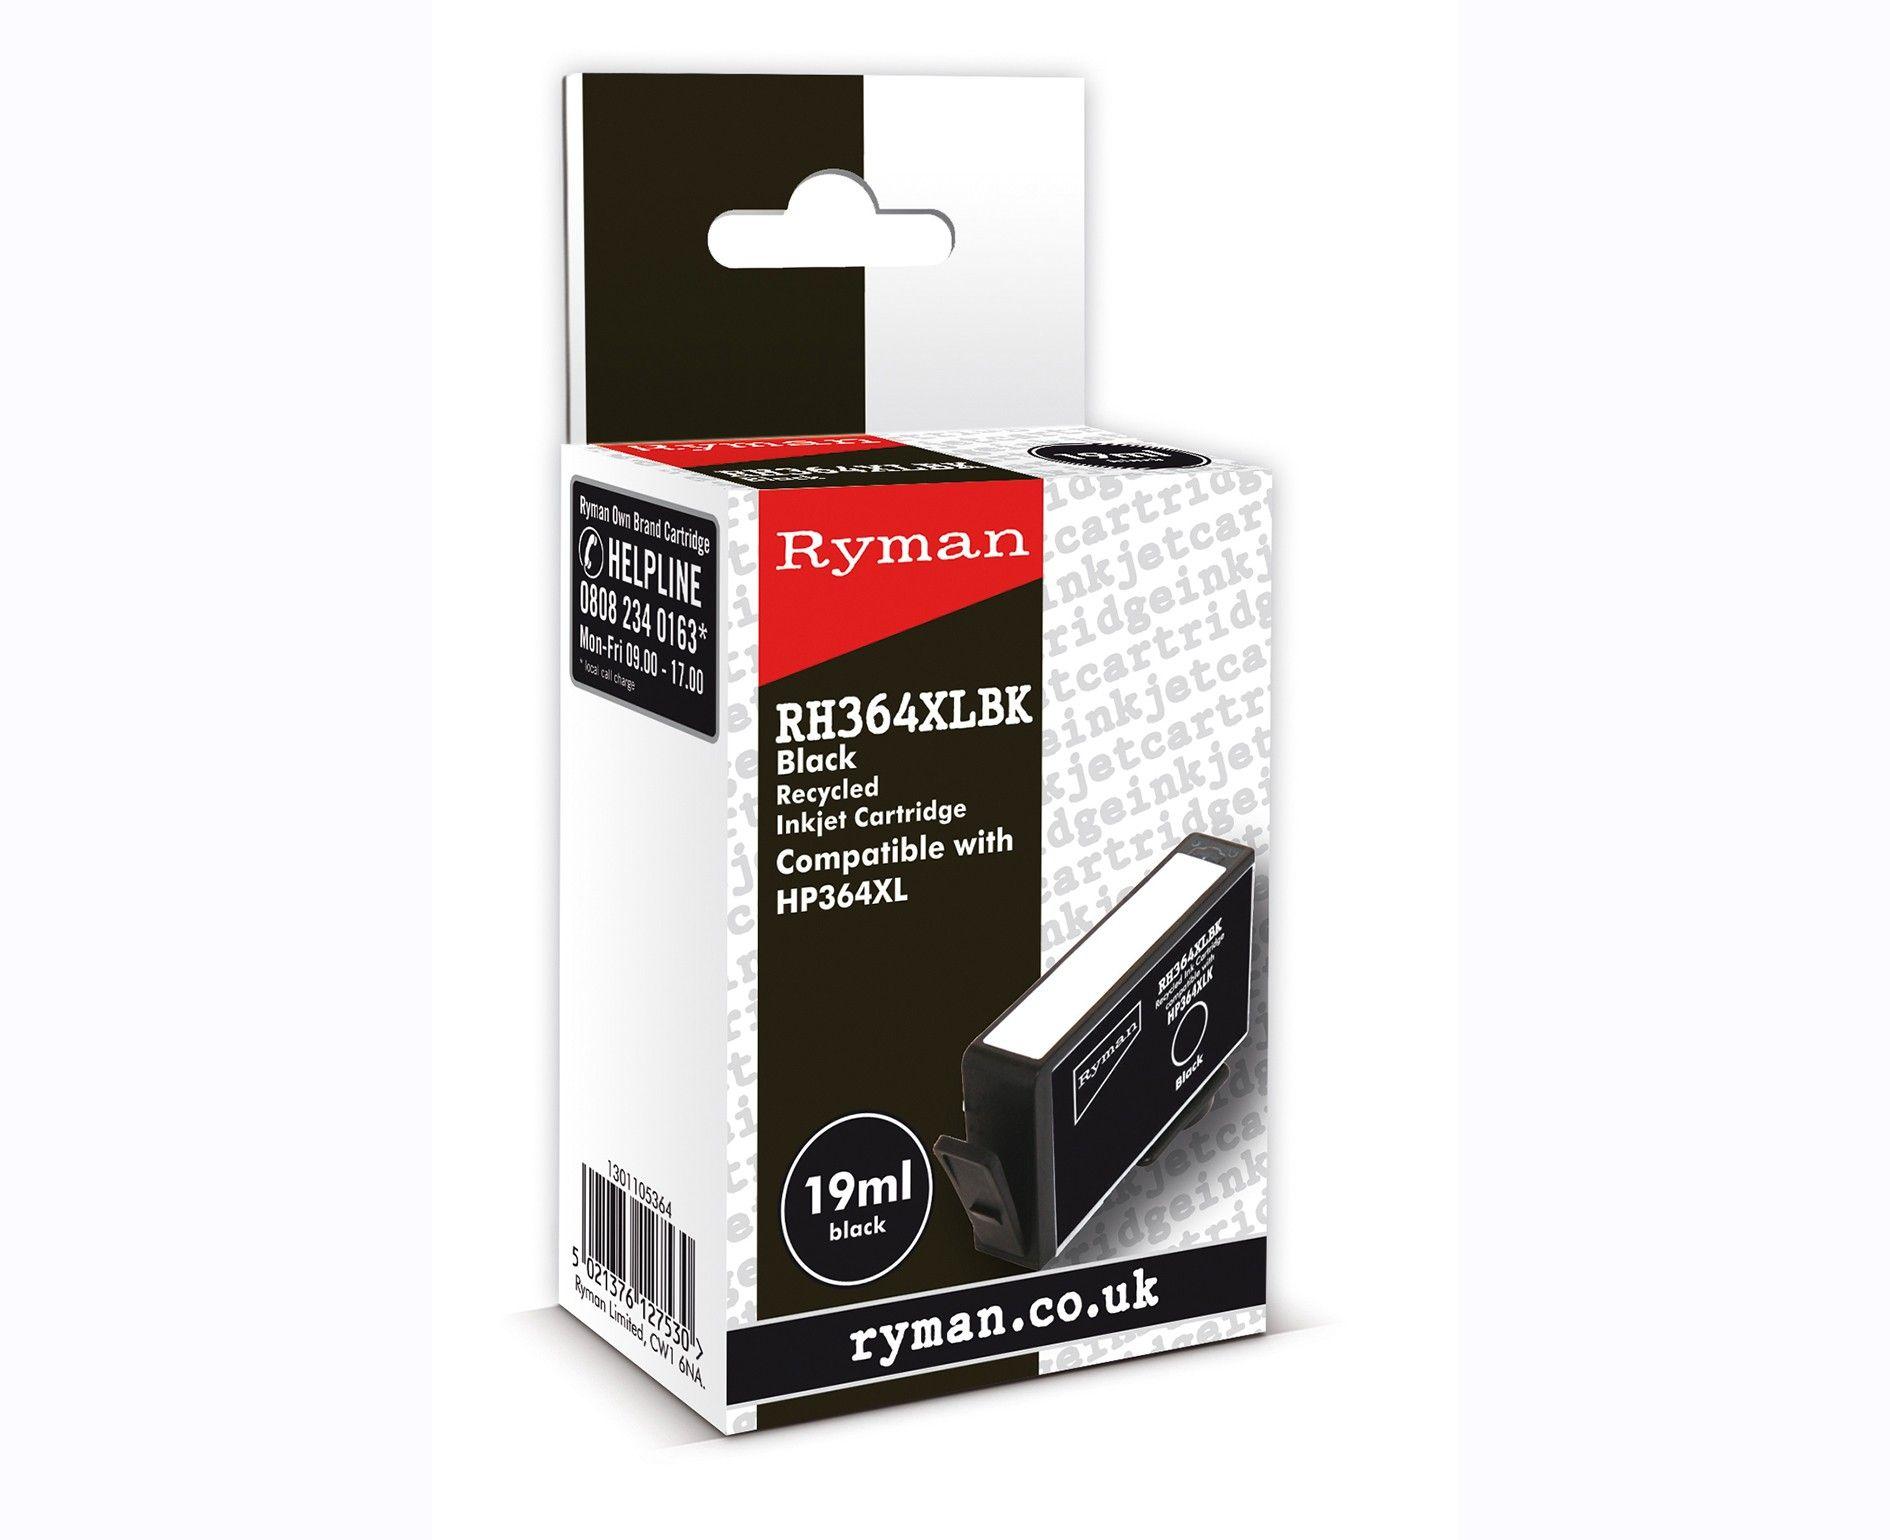 Ryman HP Inkjet Cartridge 364XL Ink cartridge